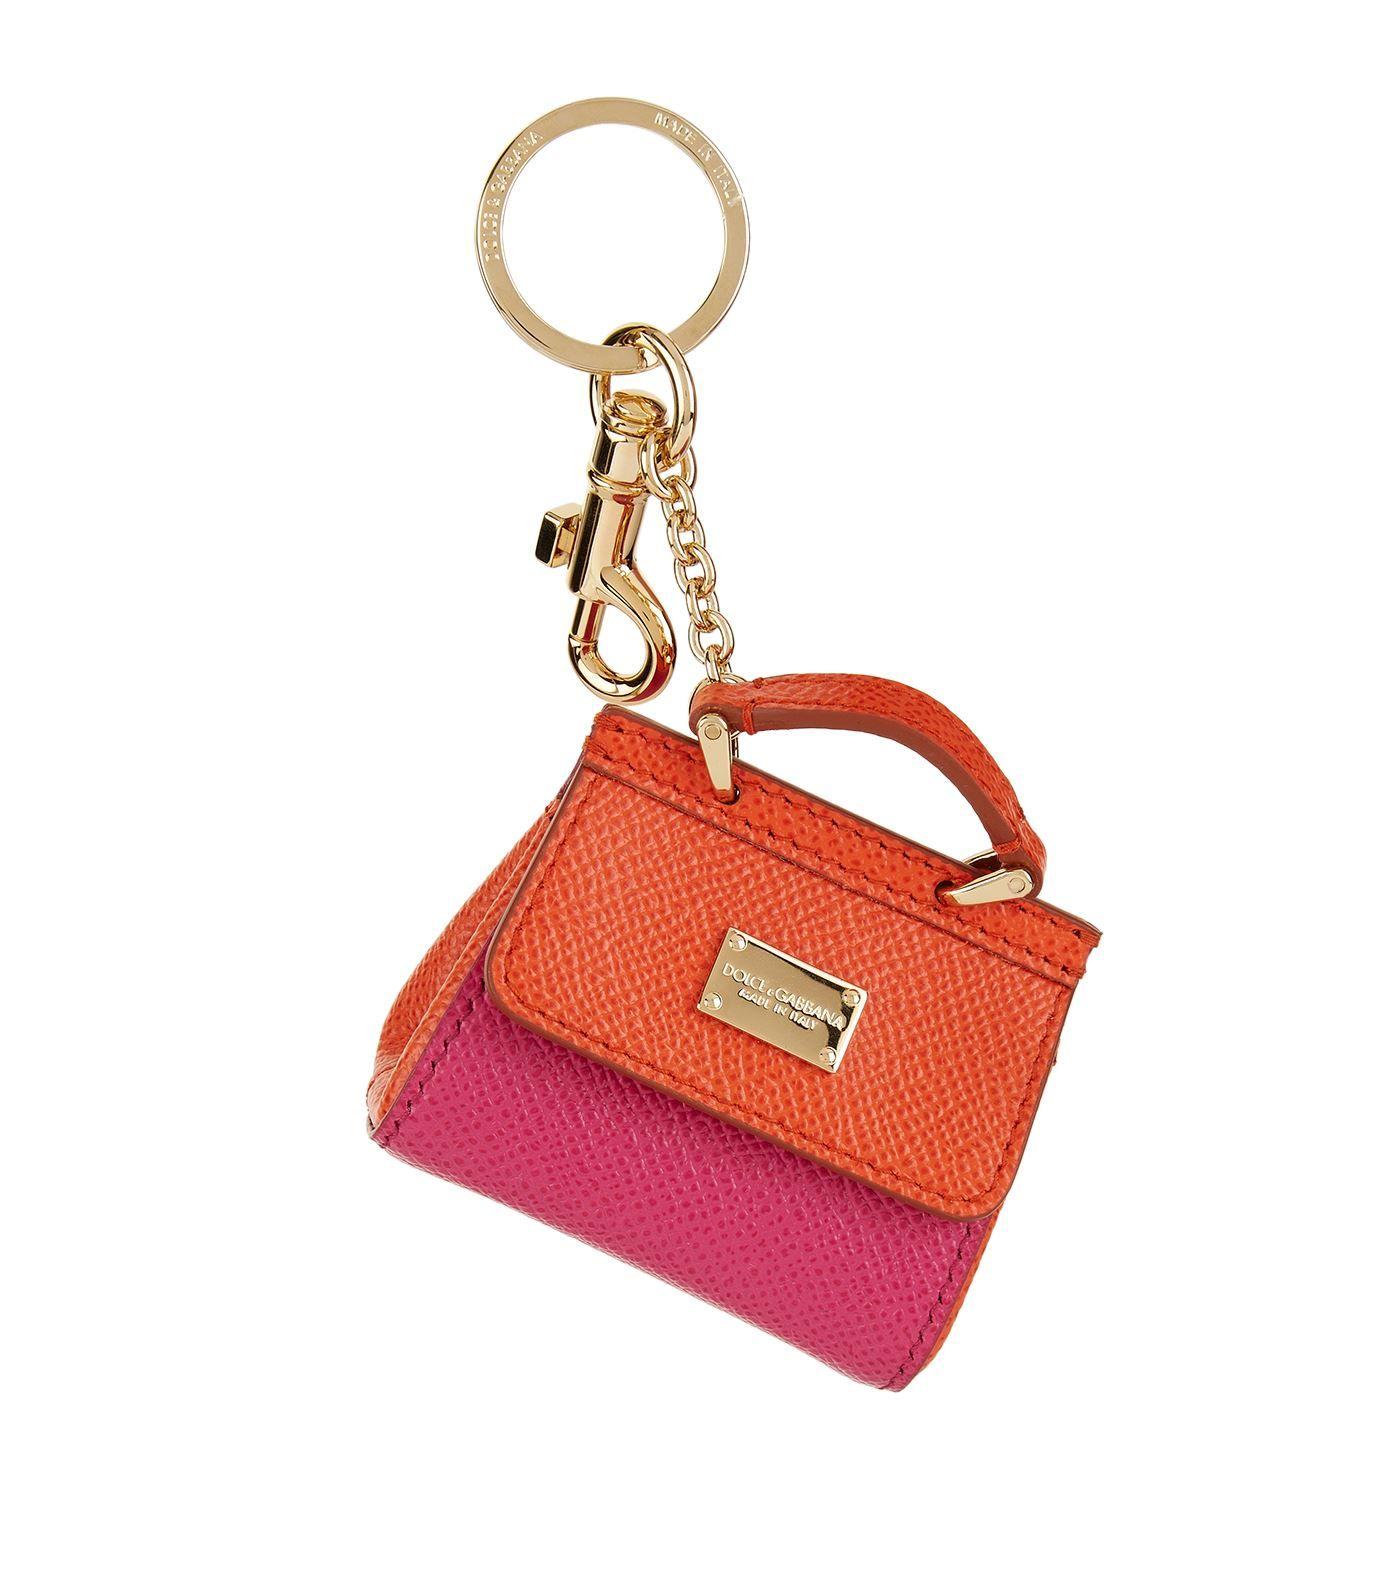 Dolce amp  Gabbana Mini Sicily bag keychain Clearance Recommend ... b92245b4ec